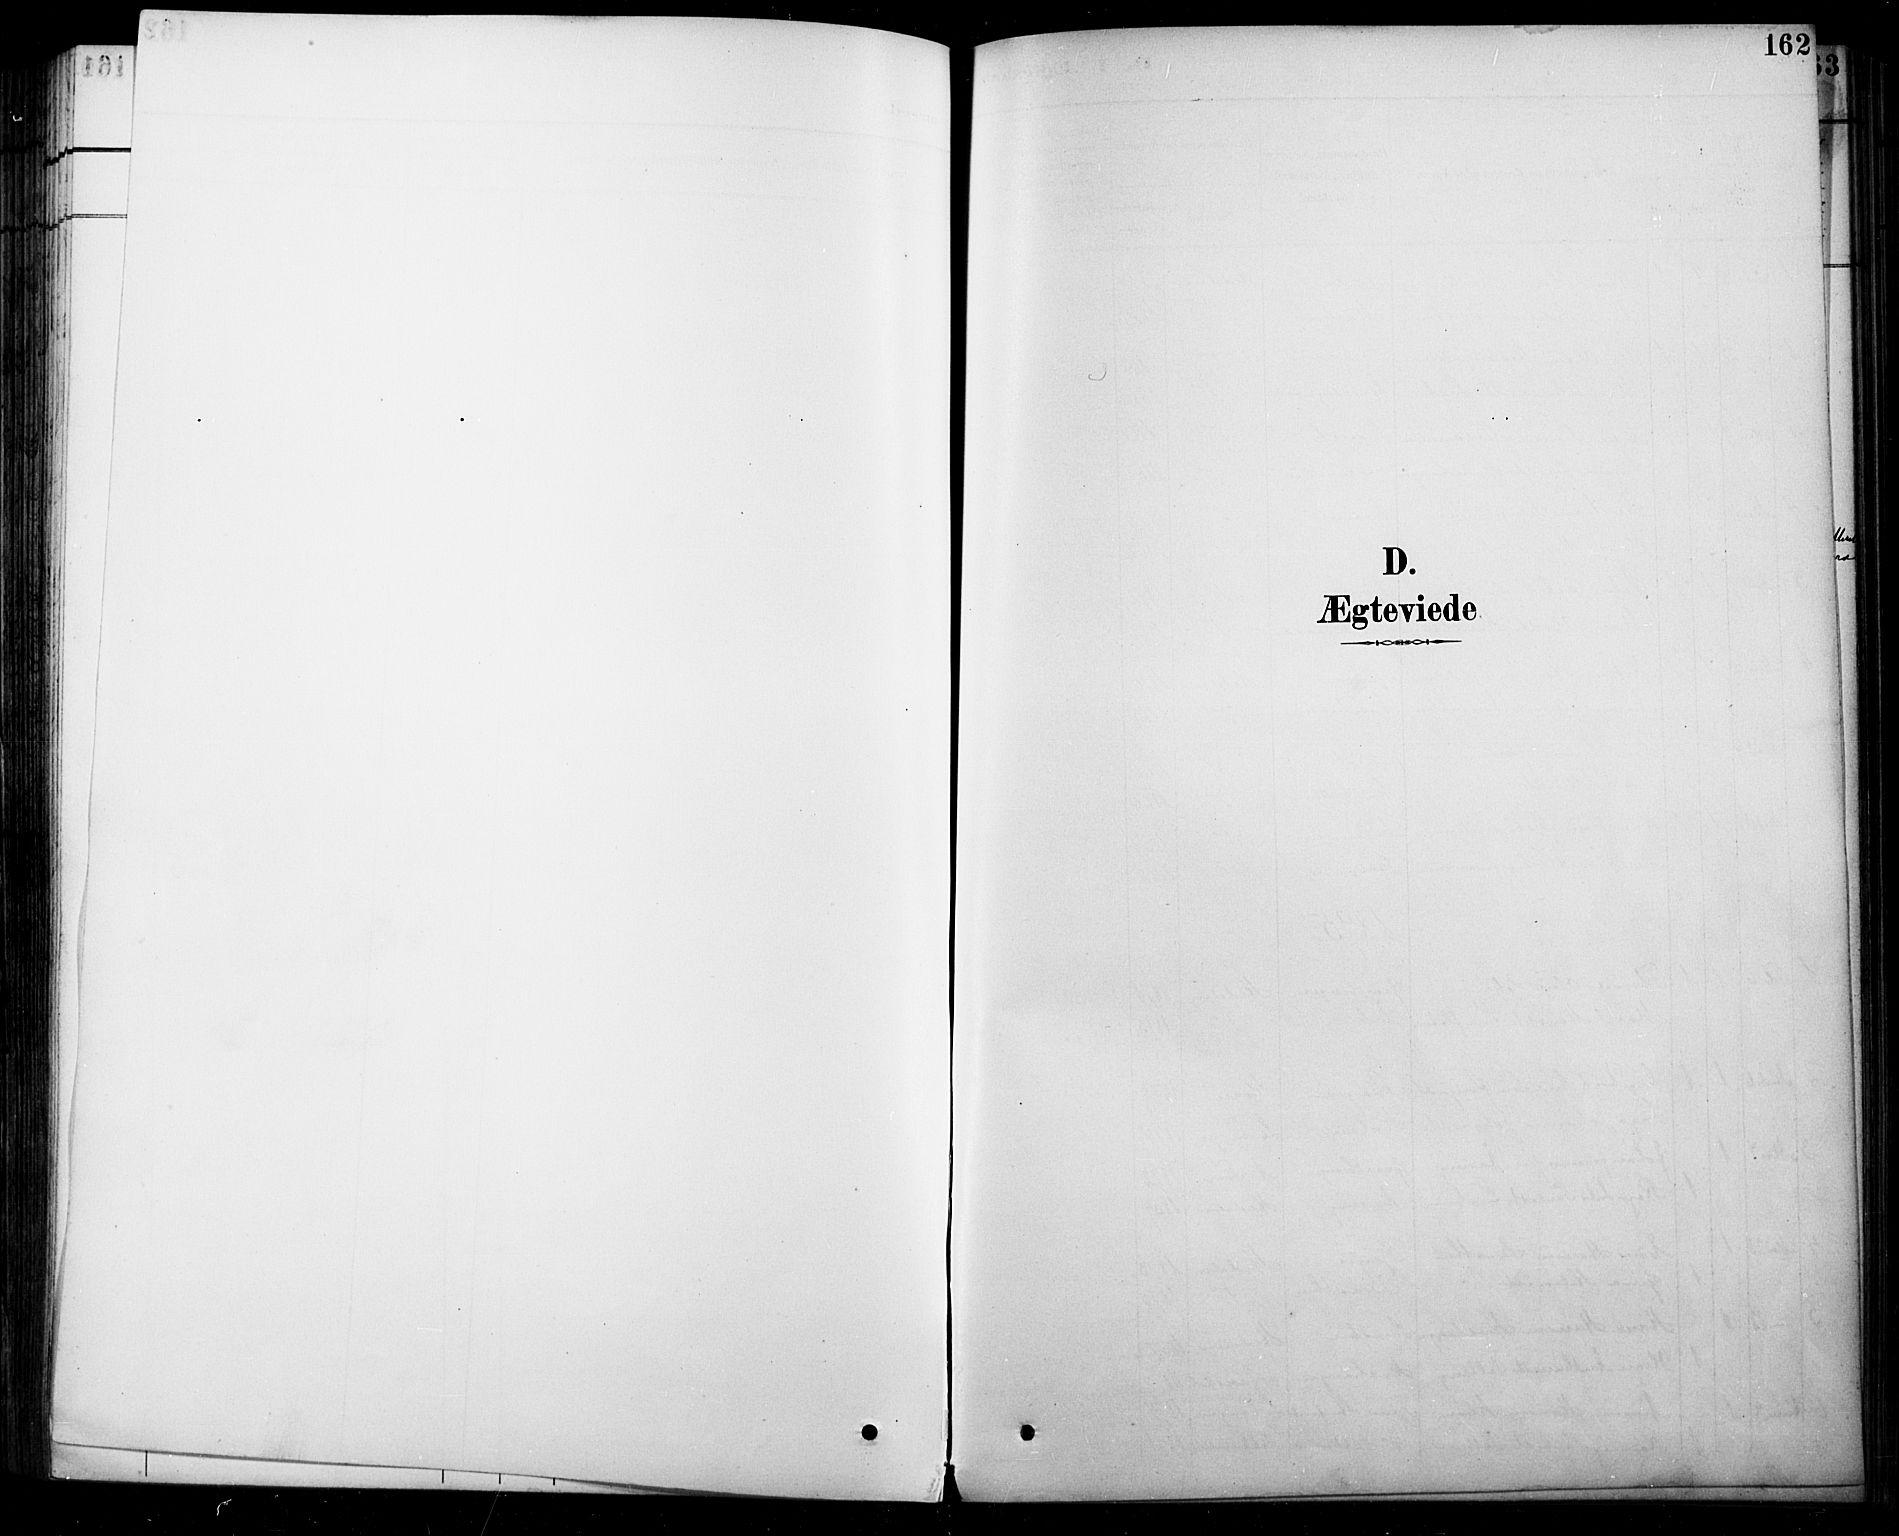 SAH, Sel prestekontor, Klokkerbok nr. 5, 1894-1923, s. 162